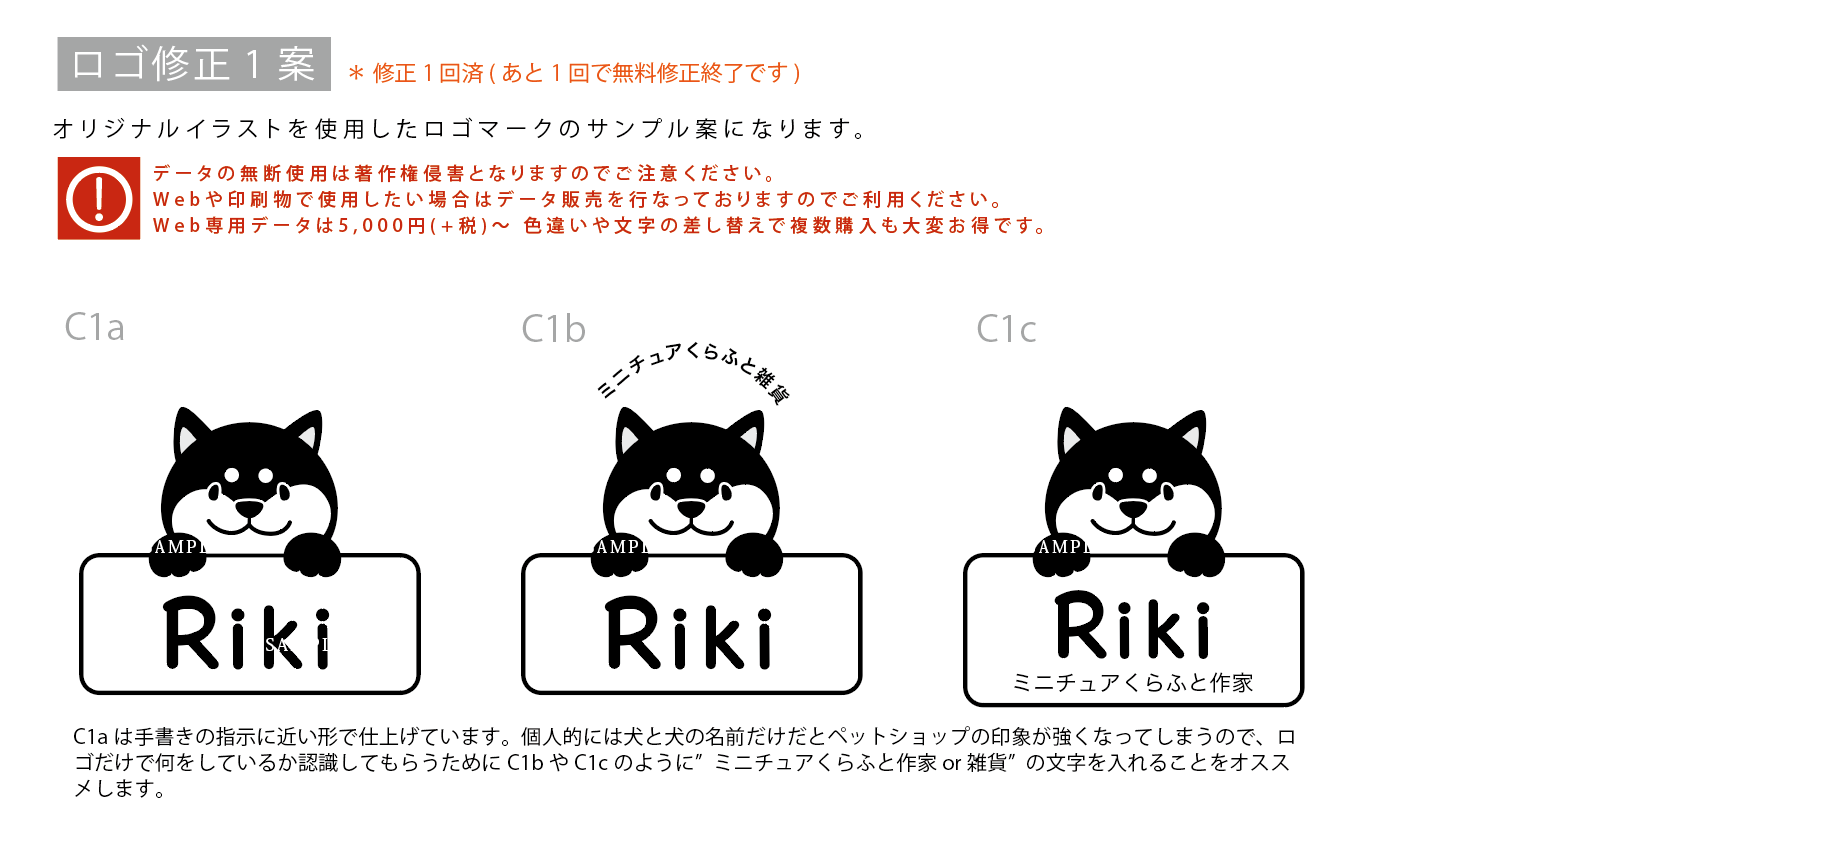 Riki様名刺ロゴデザイン1案